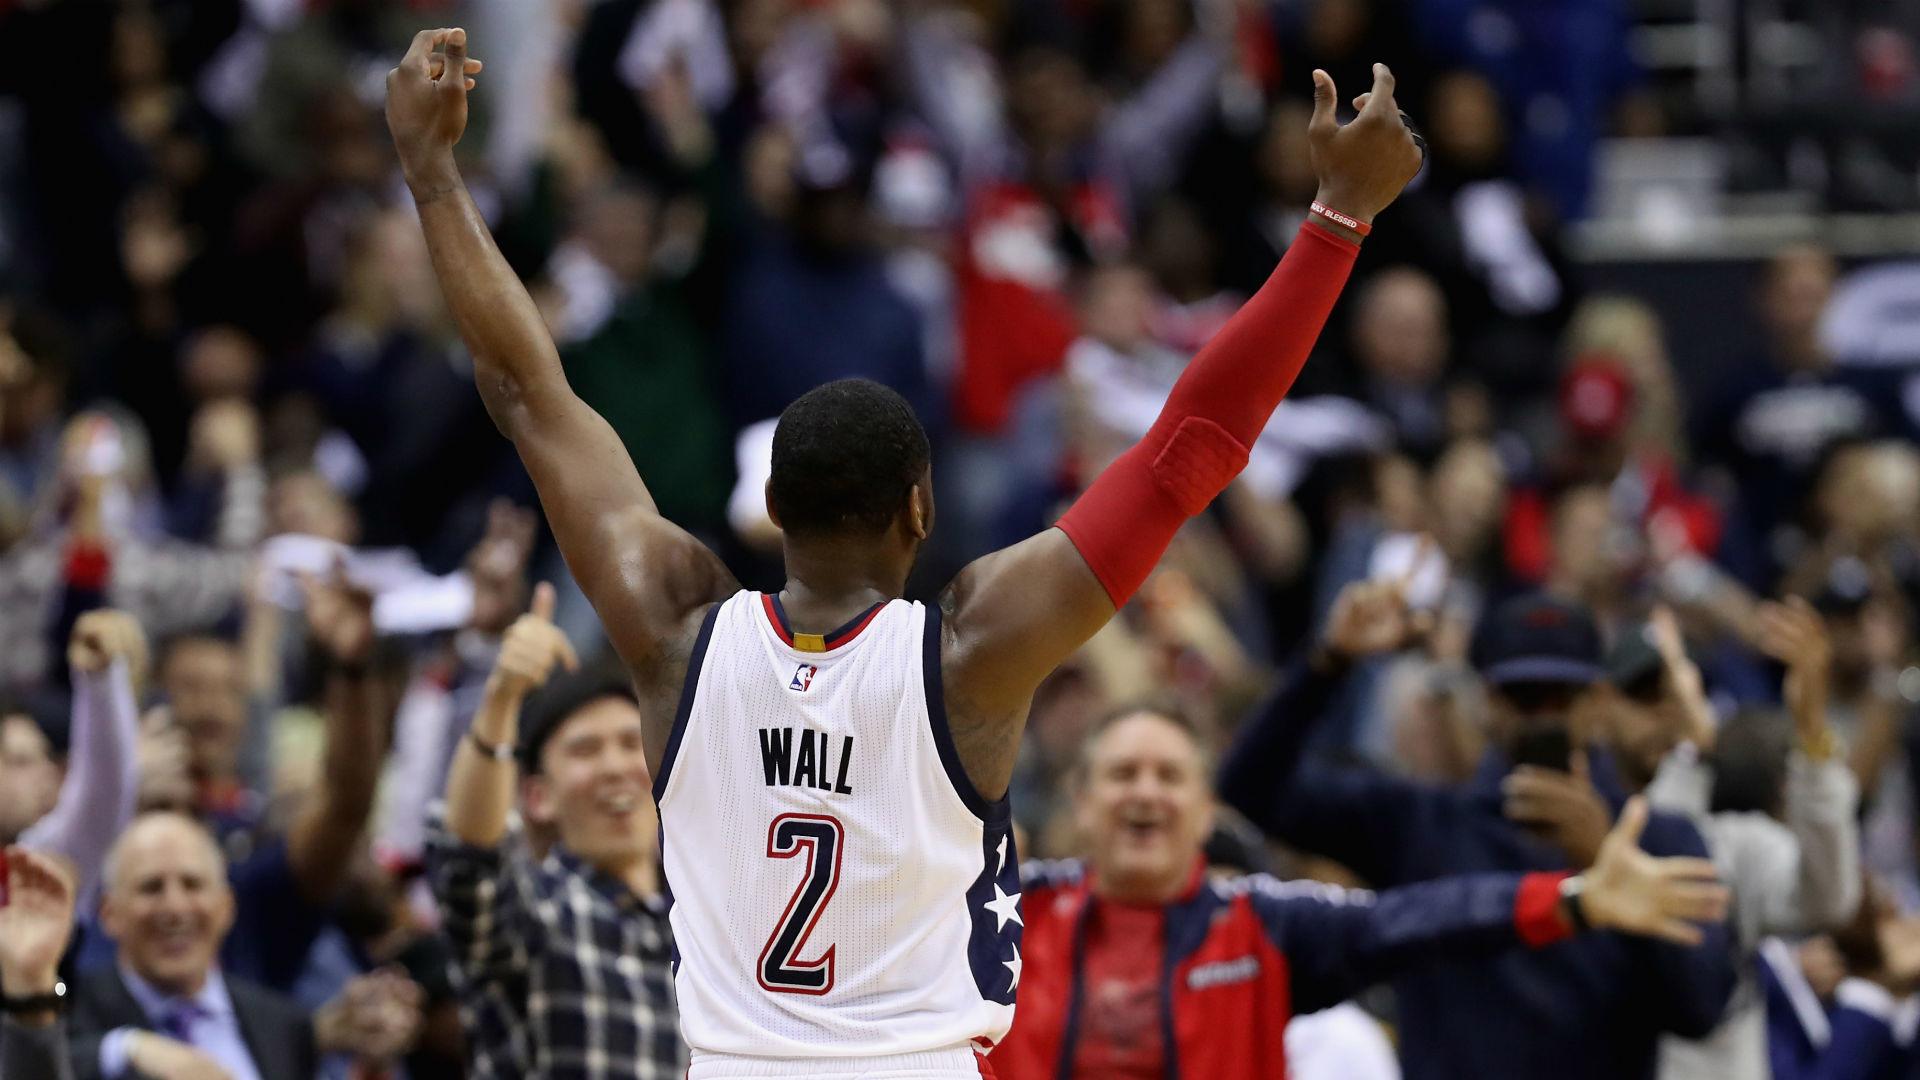 NBA playoffs 2017: Wizards, Rockets, Warriors take commanding 2-0 leads |  NBA | Sporting News